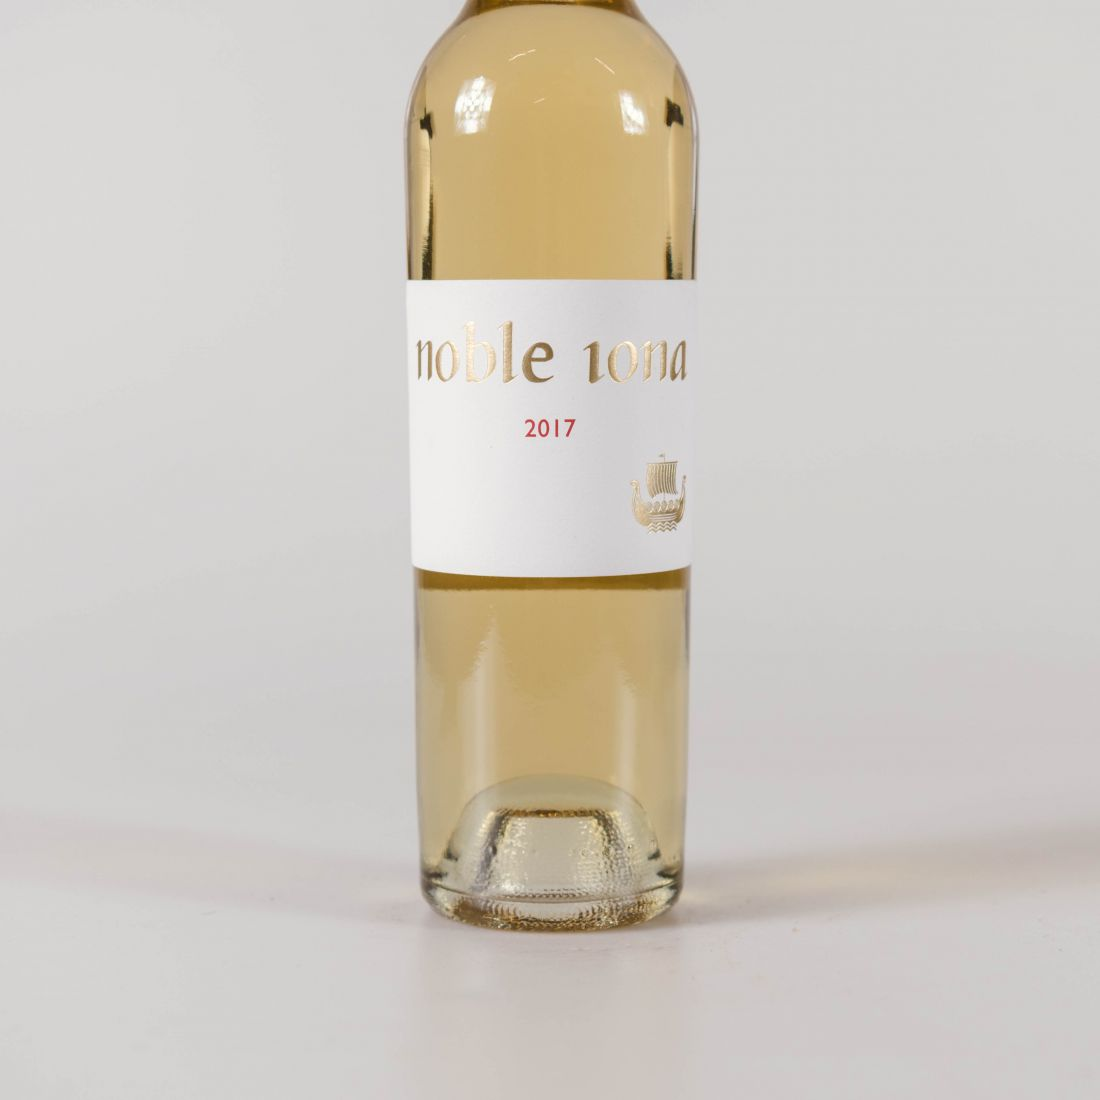 12 fles noble late sauvignon blanc